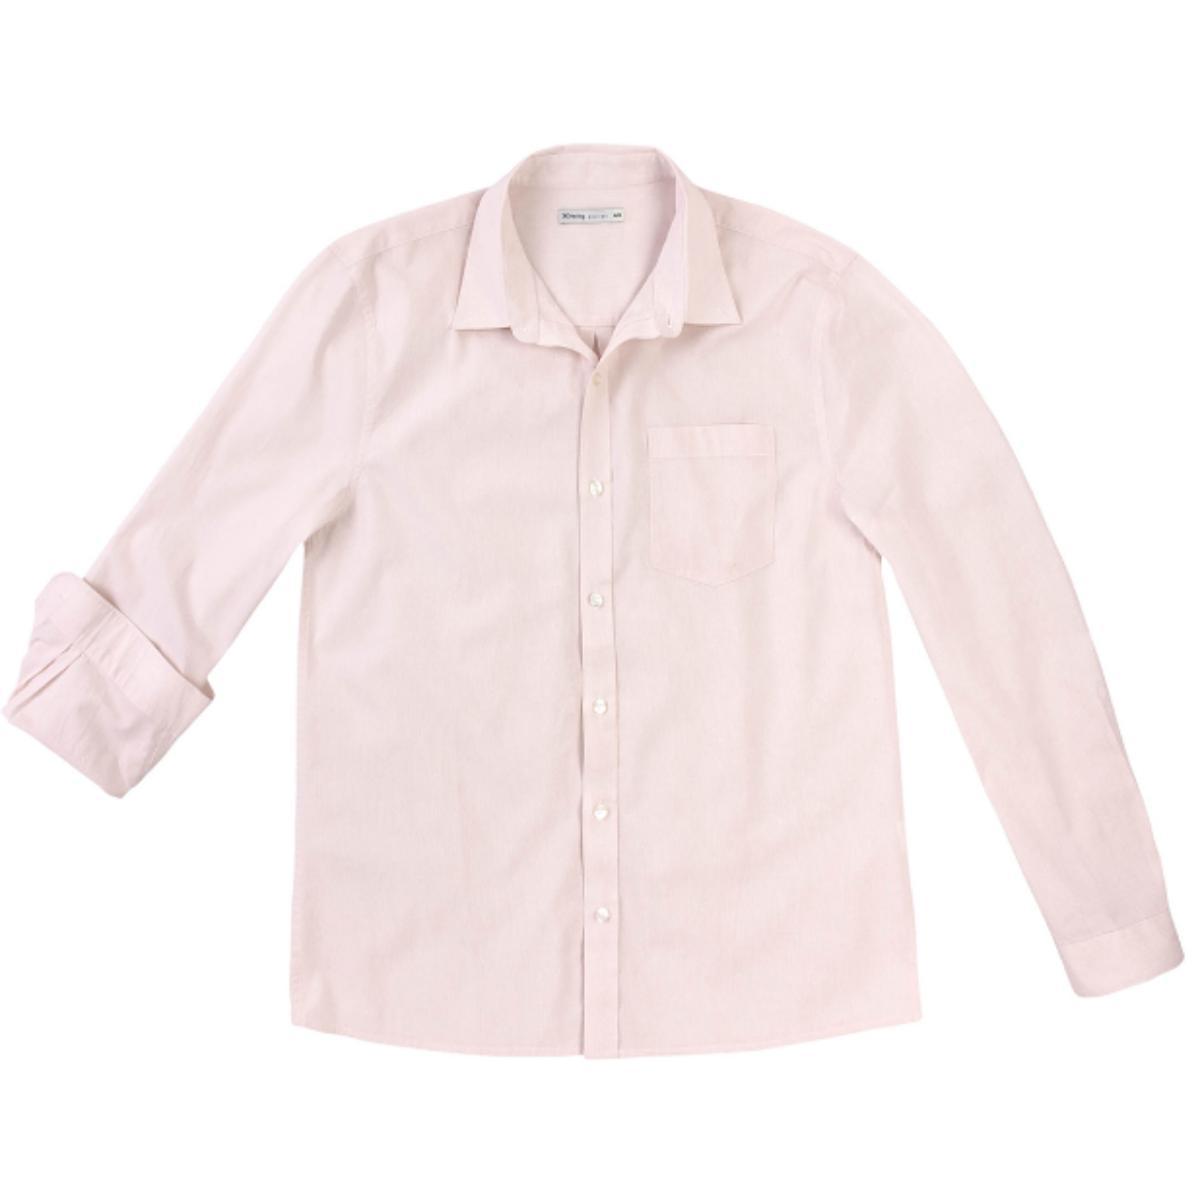 Camisa Masculina Hering K47b 1bsi Rosa Claro